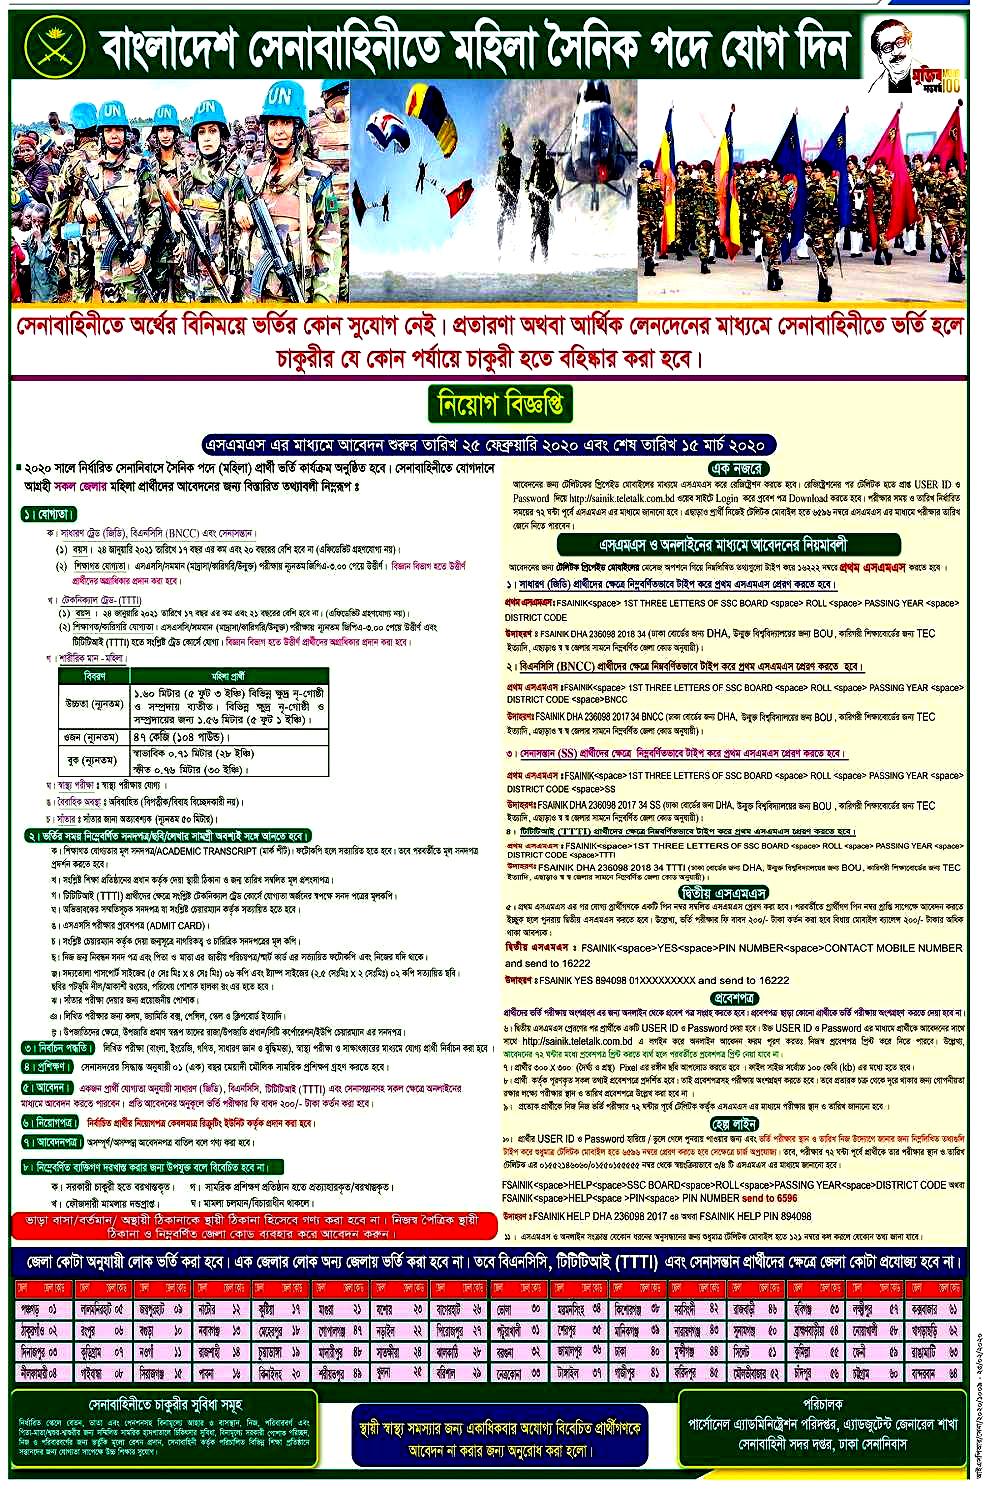 Bangladesh female army job circular